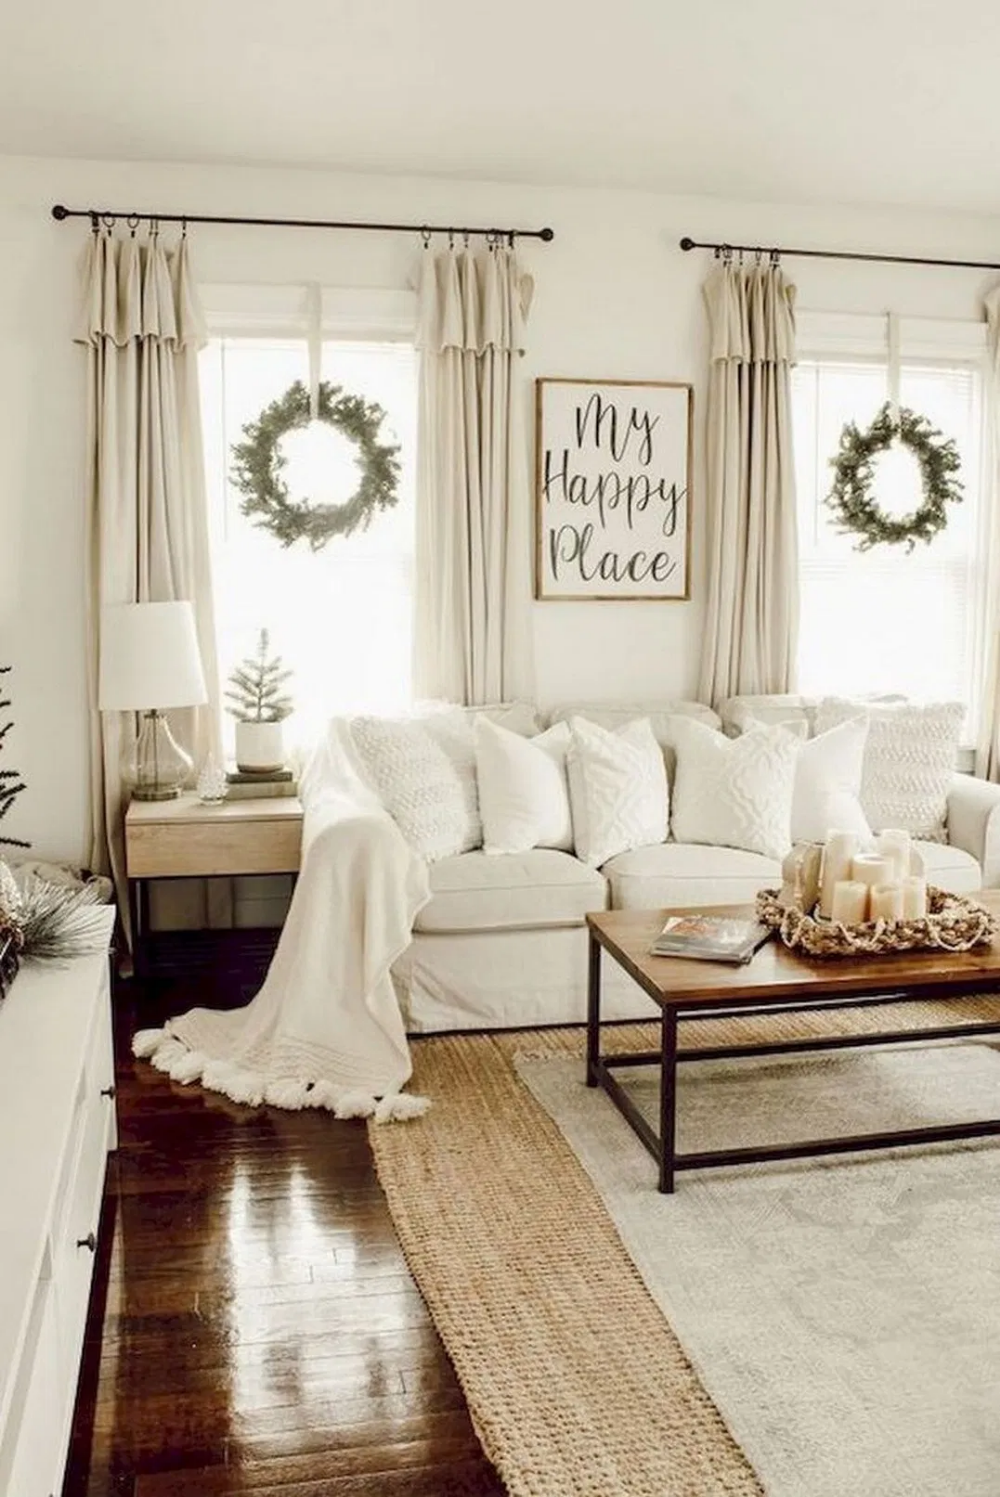 37 cozy farmhouse living room decor ideas 32   37 cozy farmhouse living room decor ideas 32